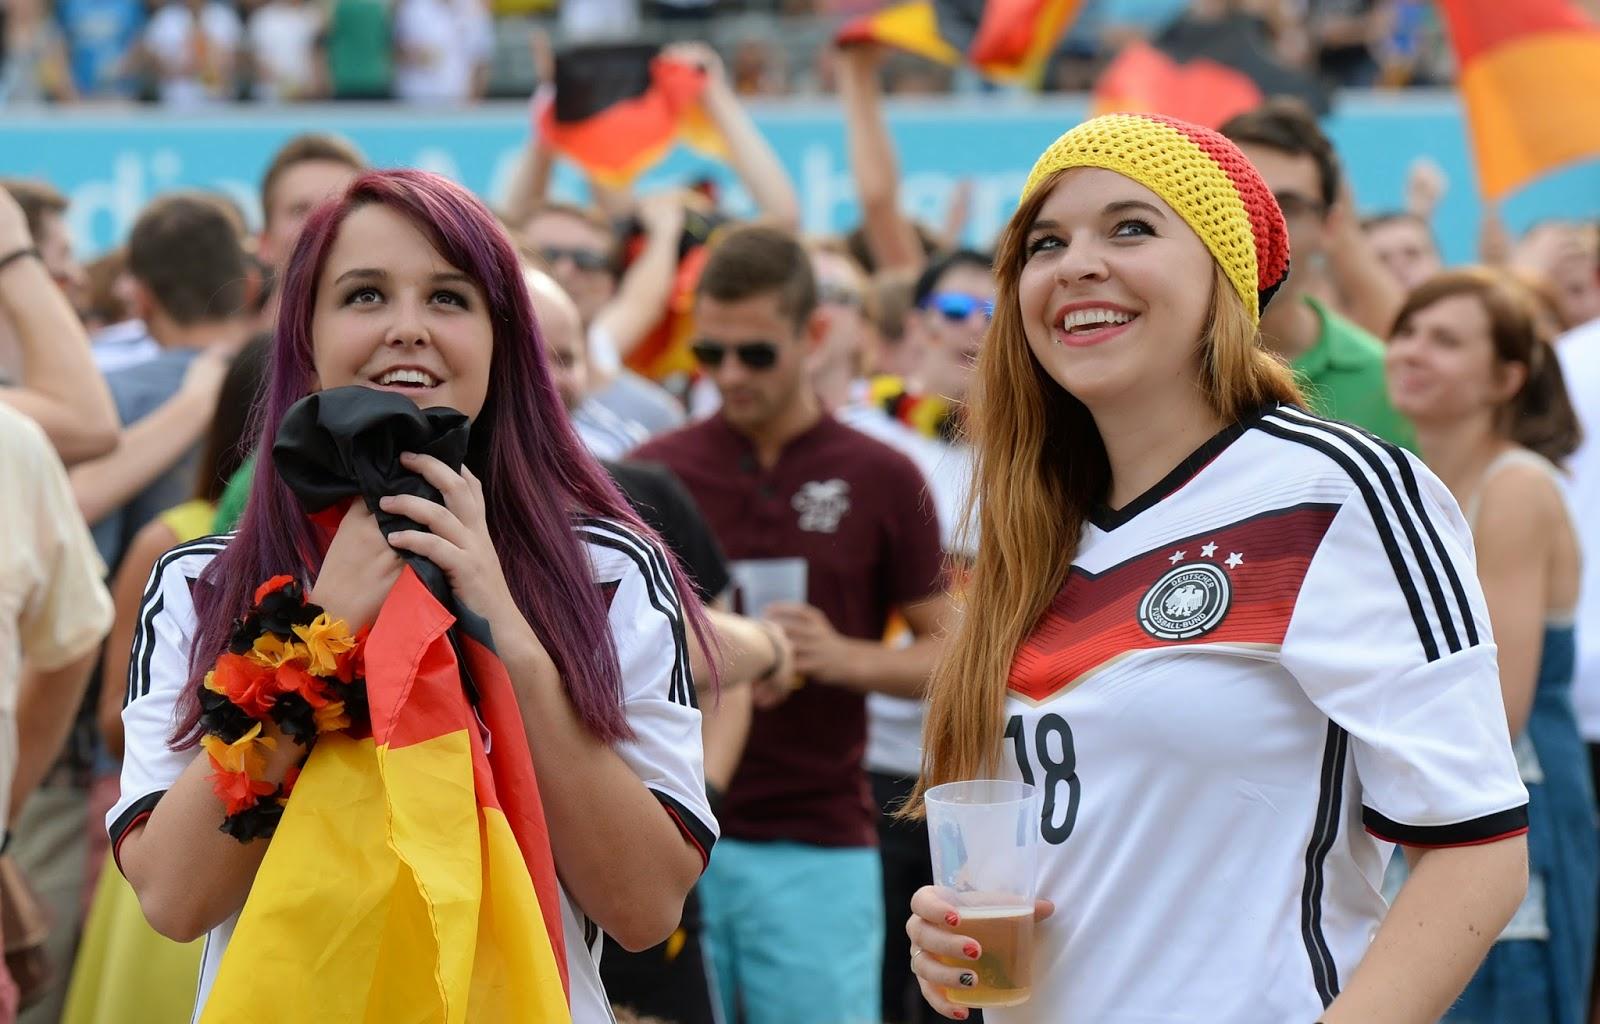 Brazil, FIFA Quarter Final, FIFA World Cup, FIFA World Cup 2014, FIFA World Cup Knockout, Football, France Match, France vs Germany, Germany Match, Knockout Stage, Quarter Final Matches, Round of 16,